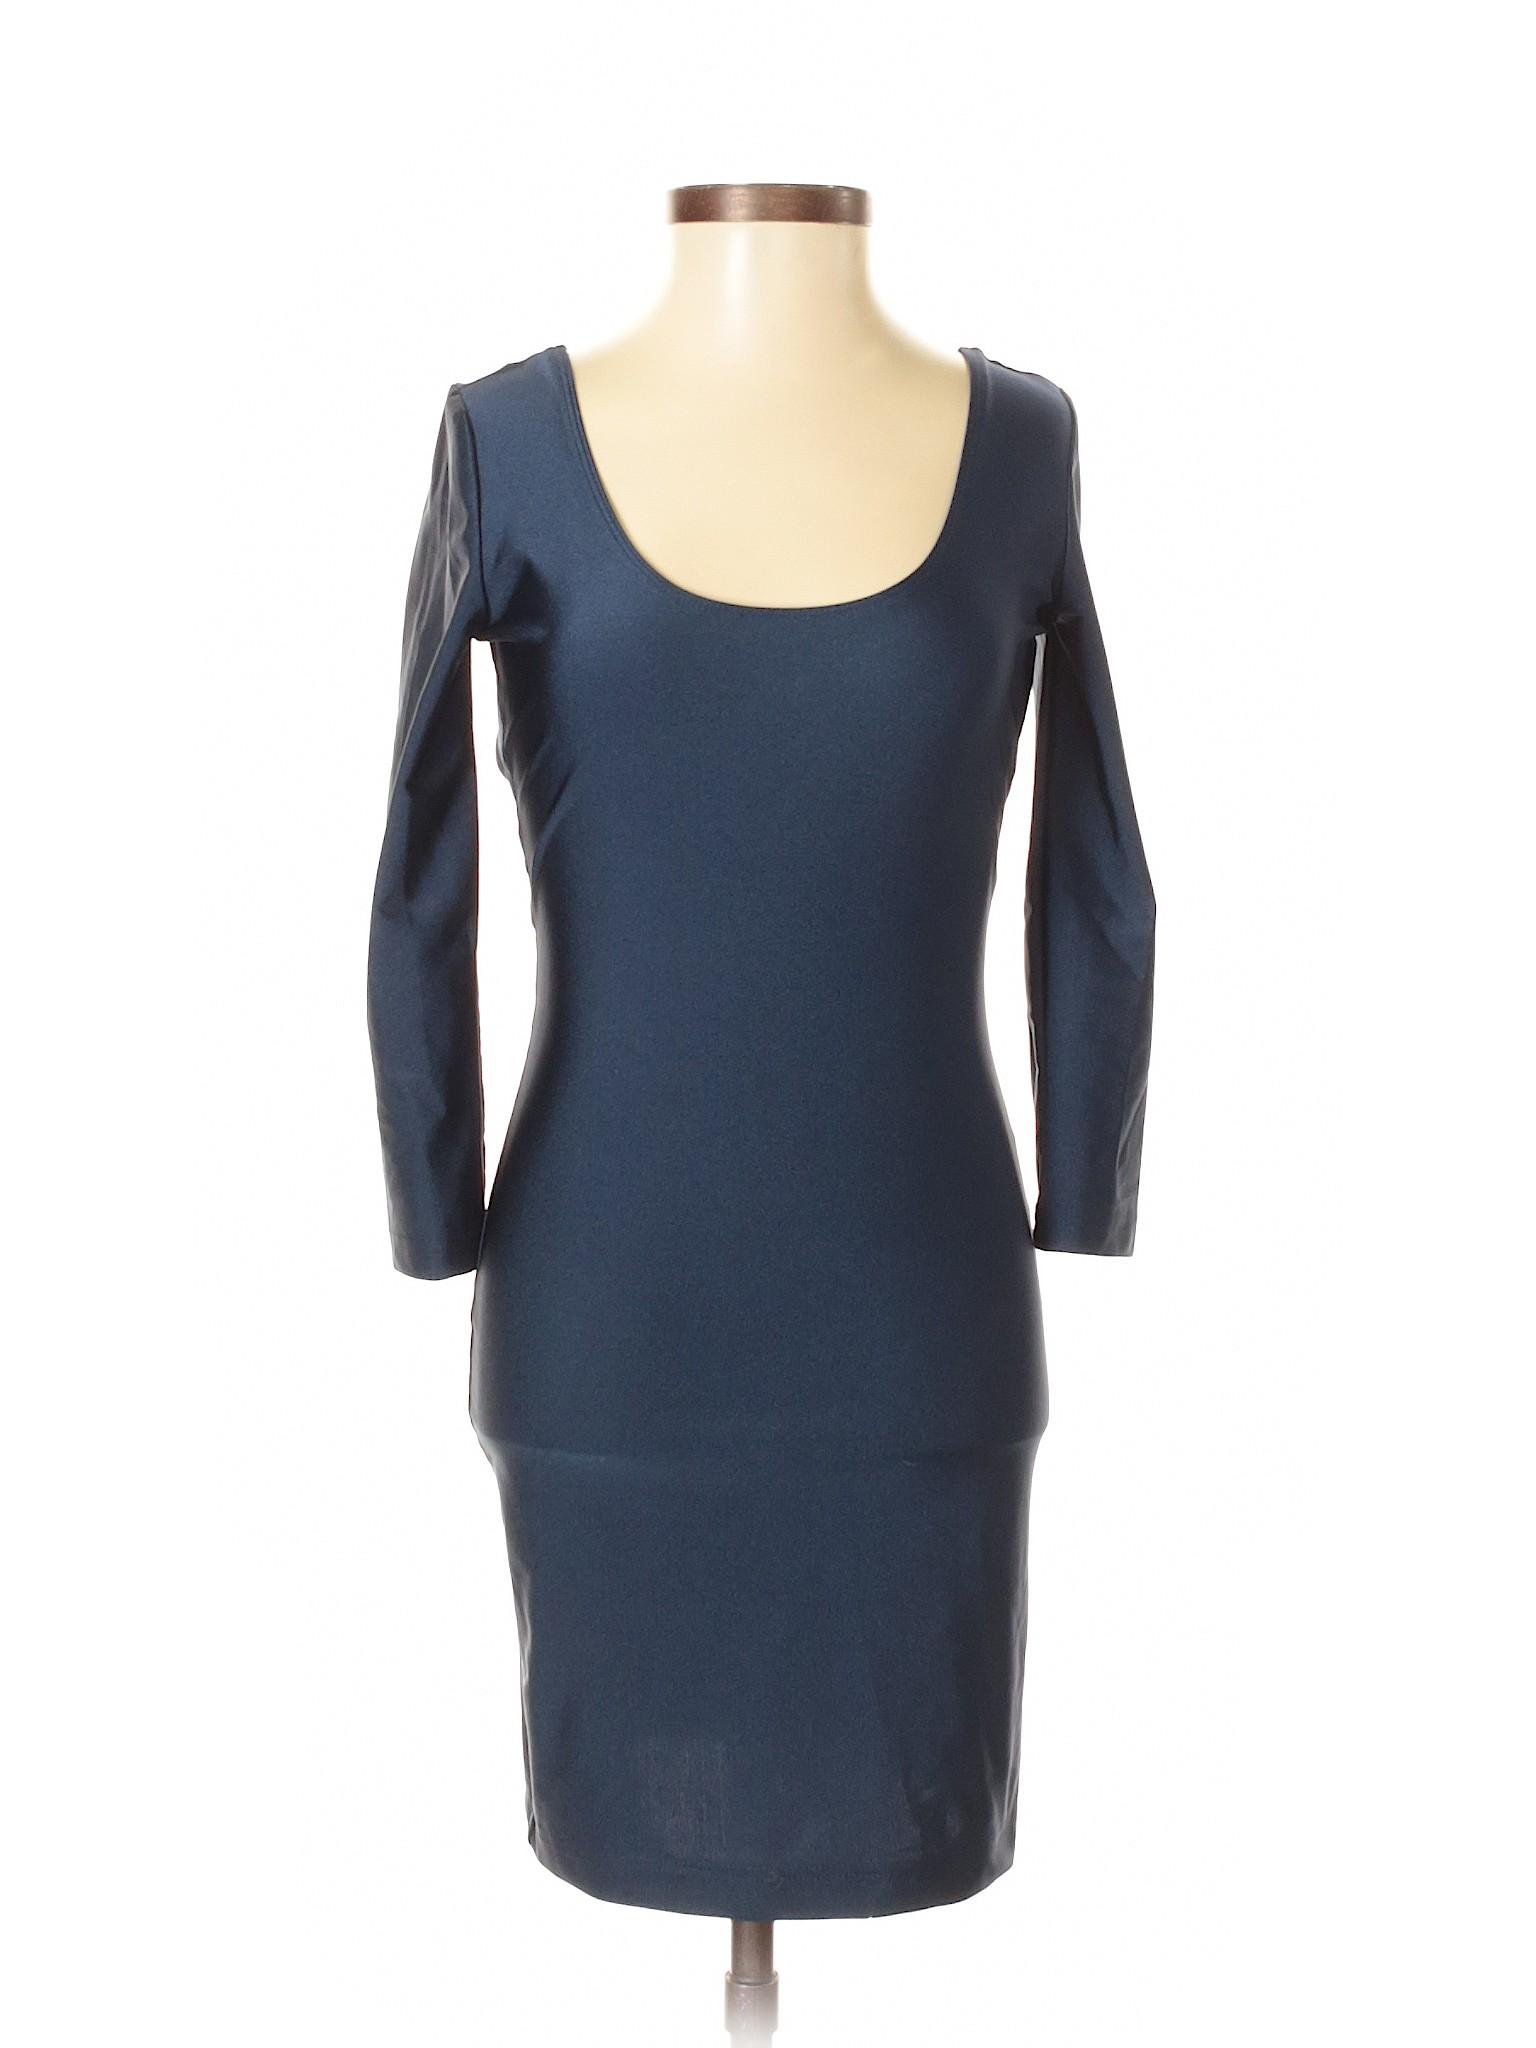 Boutique 21 Forever Casual winter Dress vwrWFqUnvx